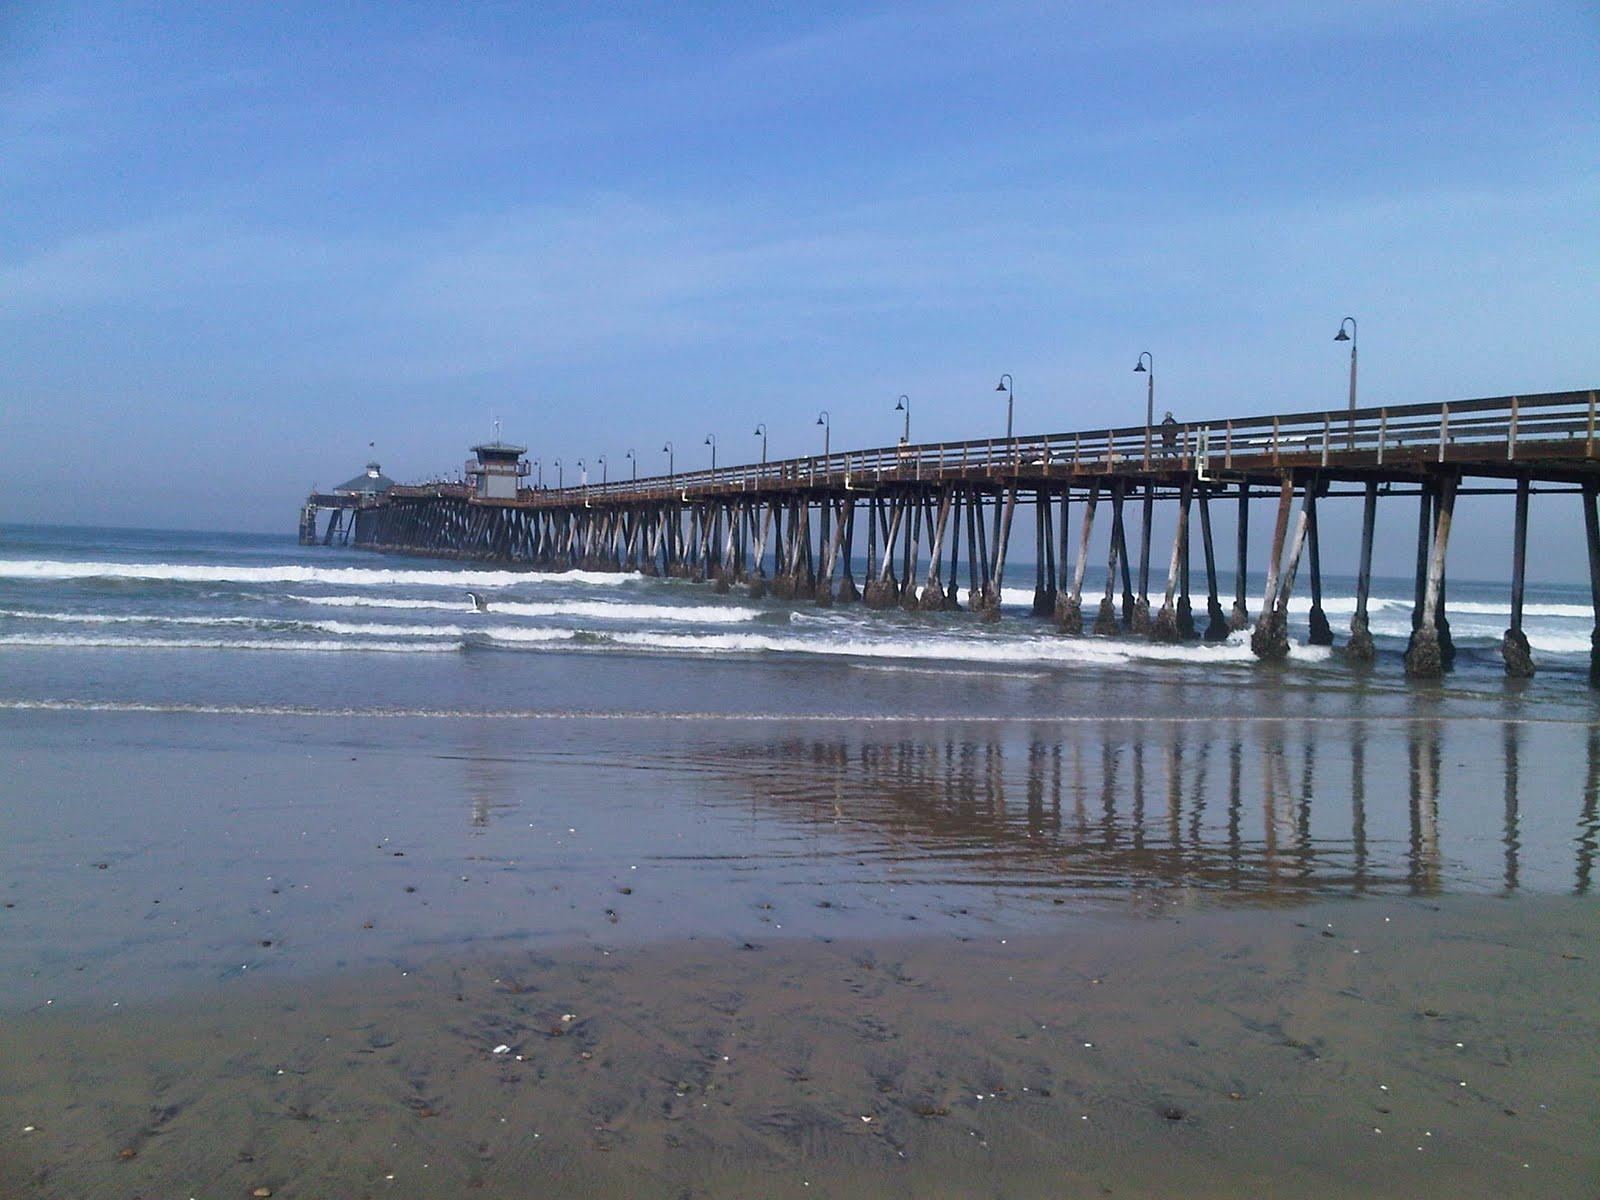 Lumpy 39 s blog san diego california for Pier fishing san diego